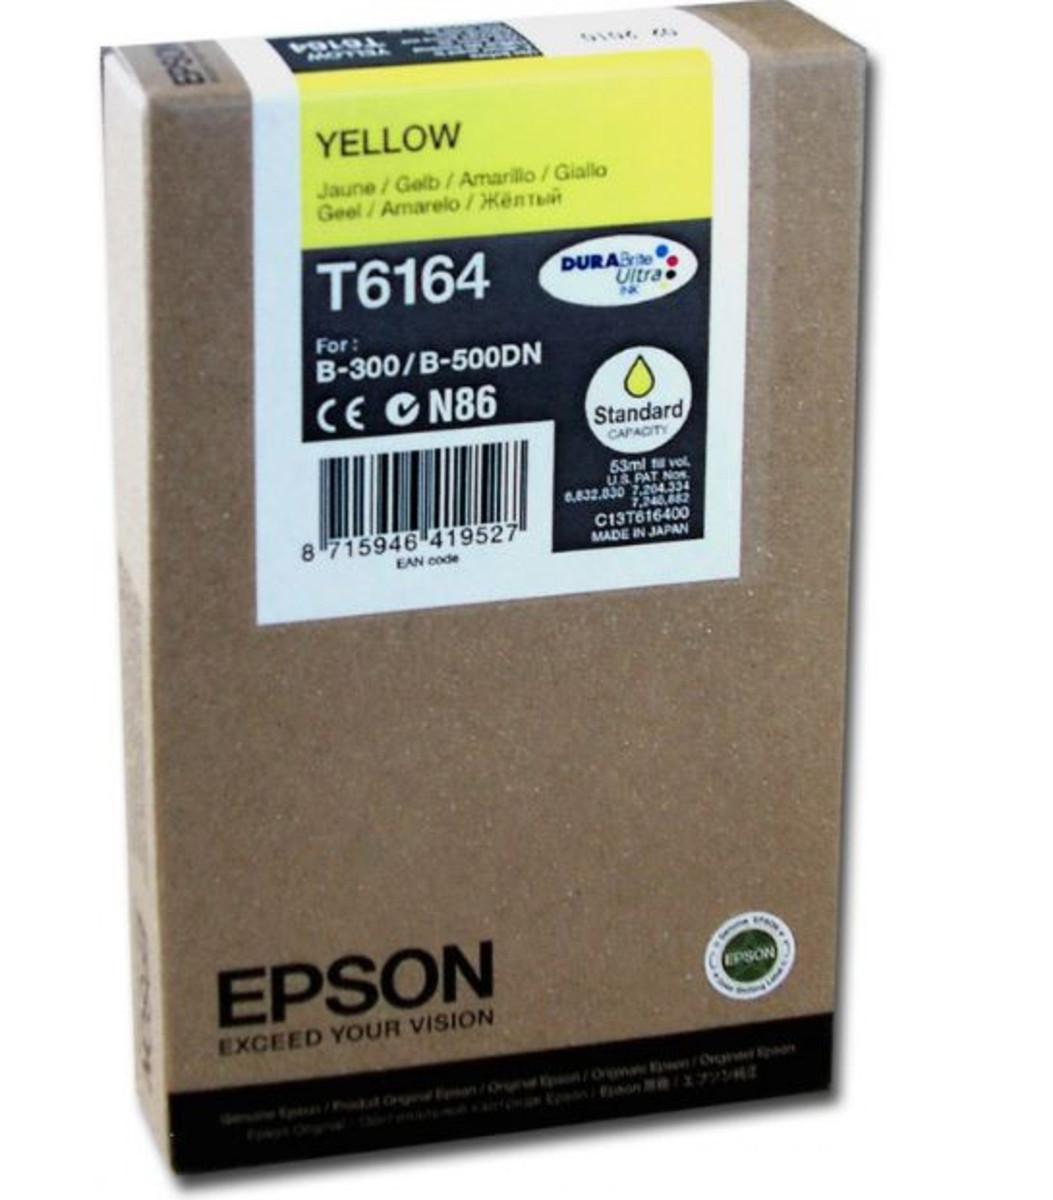 Epson C13T616400 Yelllow Ink Cartridge